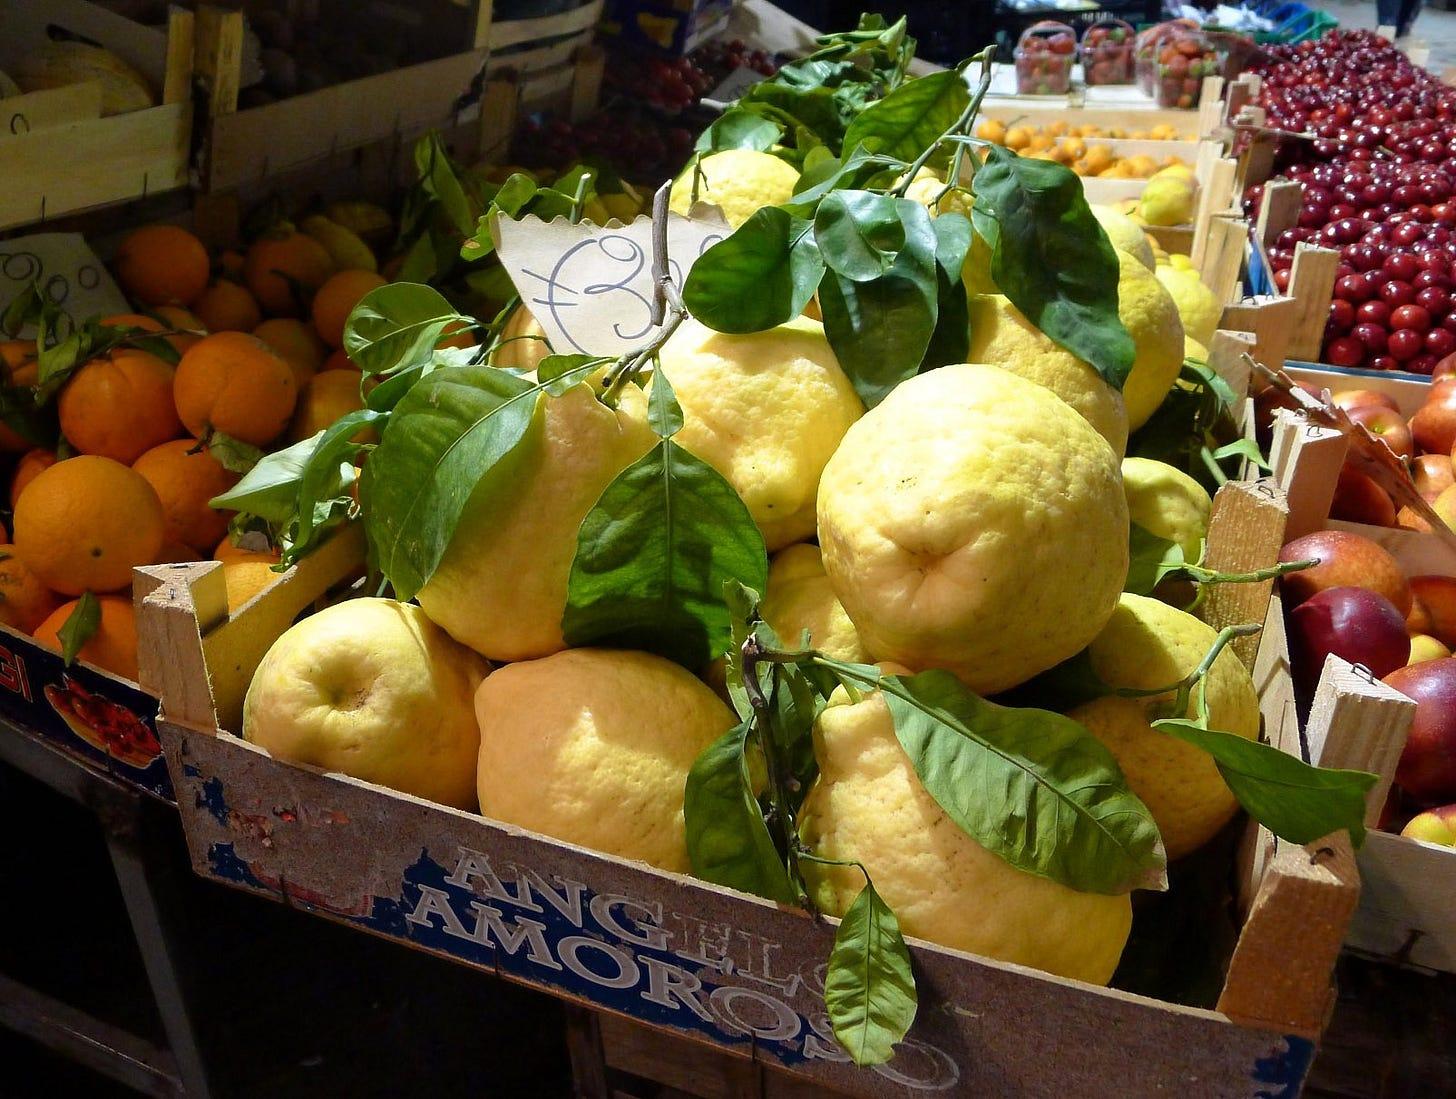 File:Limone di Sorrento.jpg - Wikimedia Commons